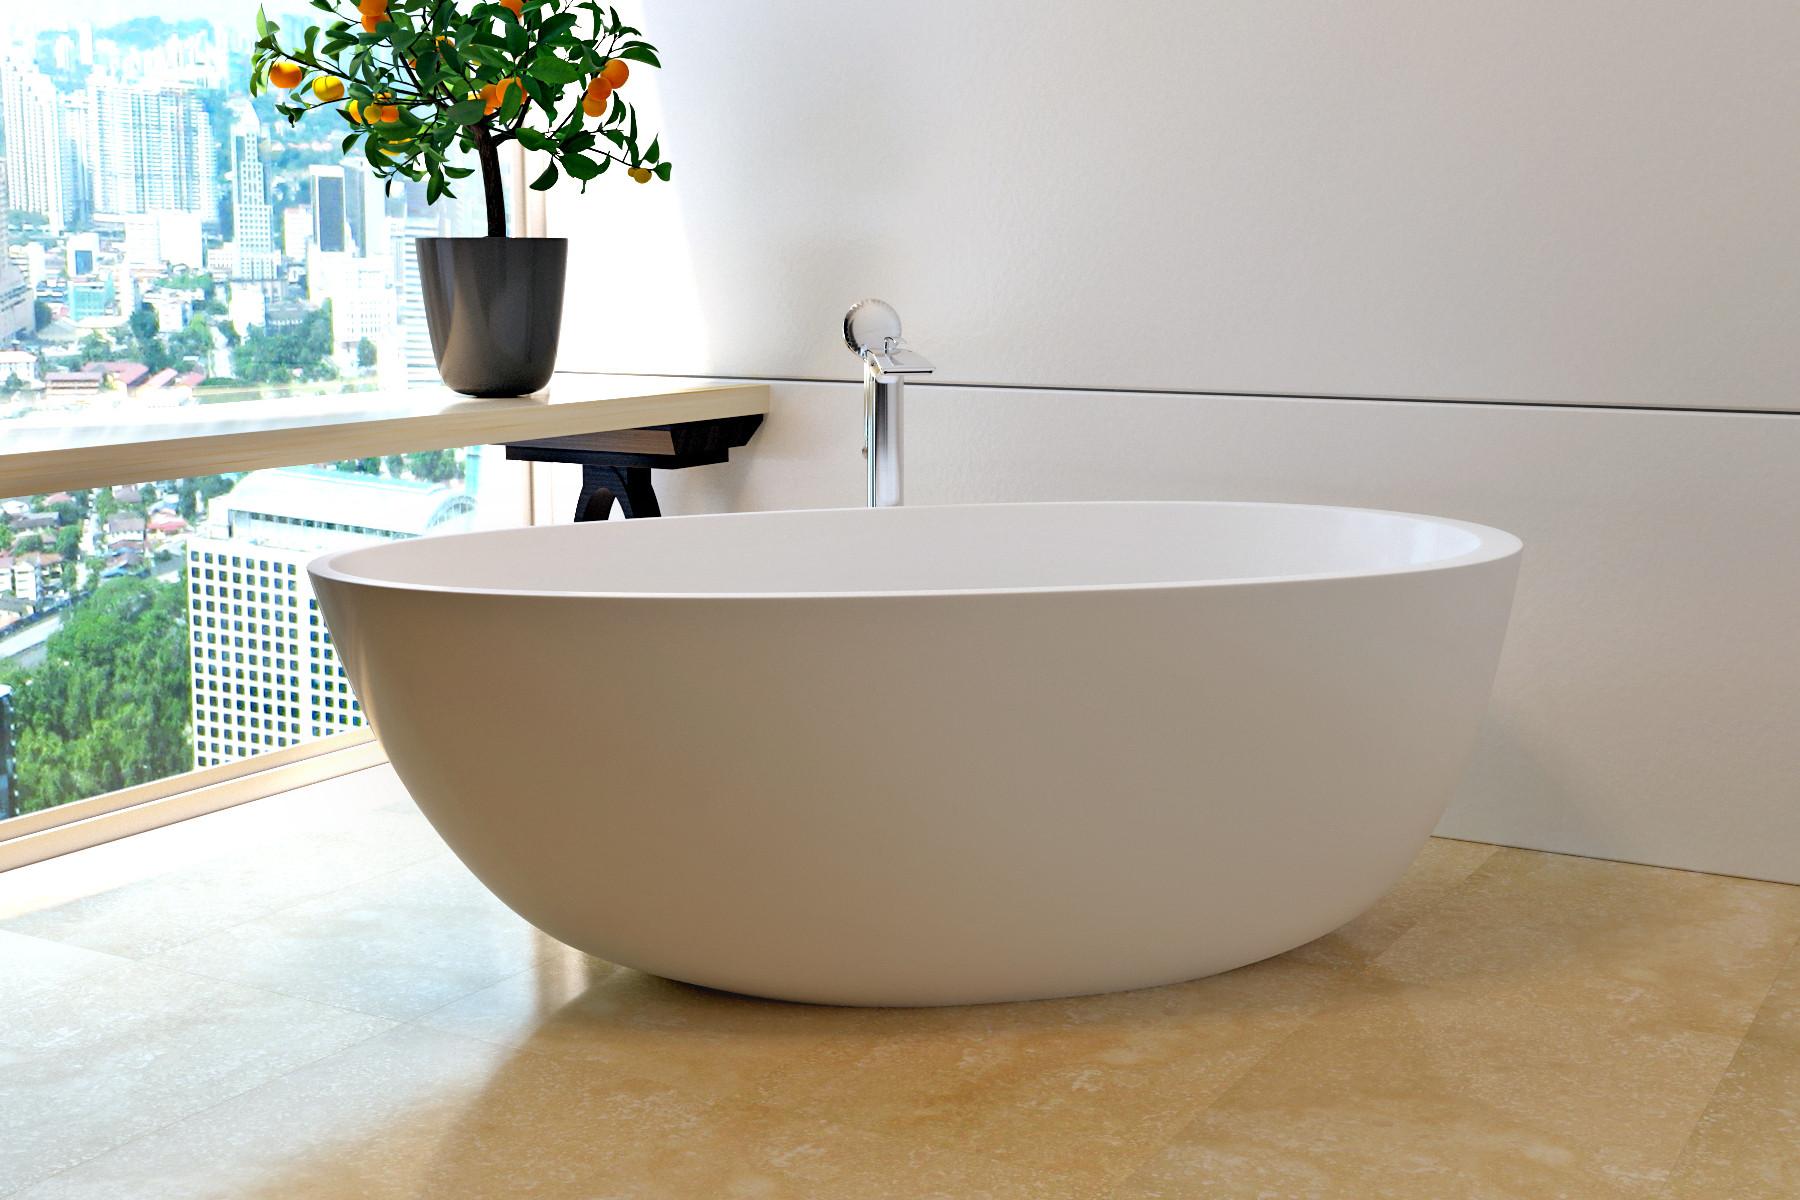 Aquatica Spoon2WM Egg Shaped Free Standing Solid Surface Bathtub in White